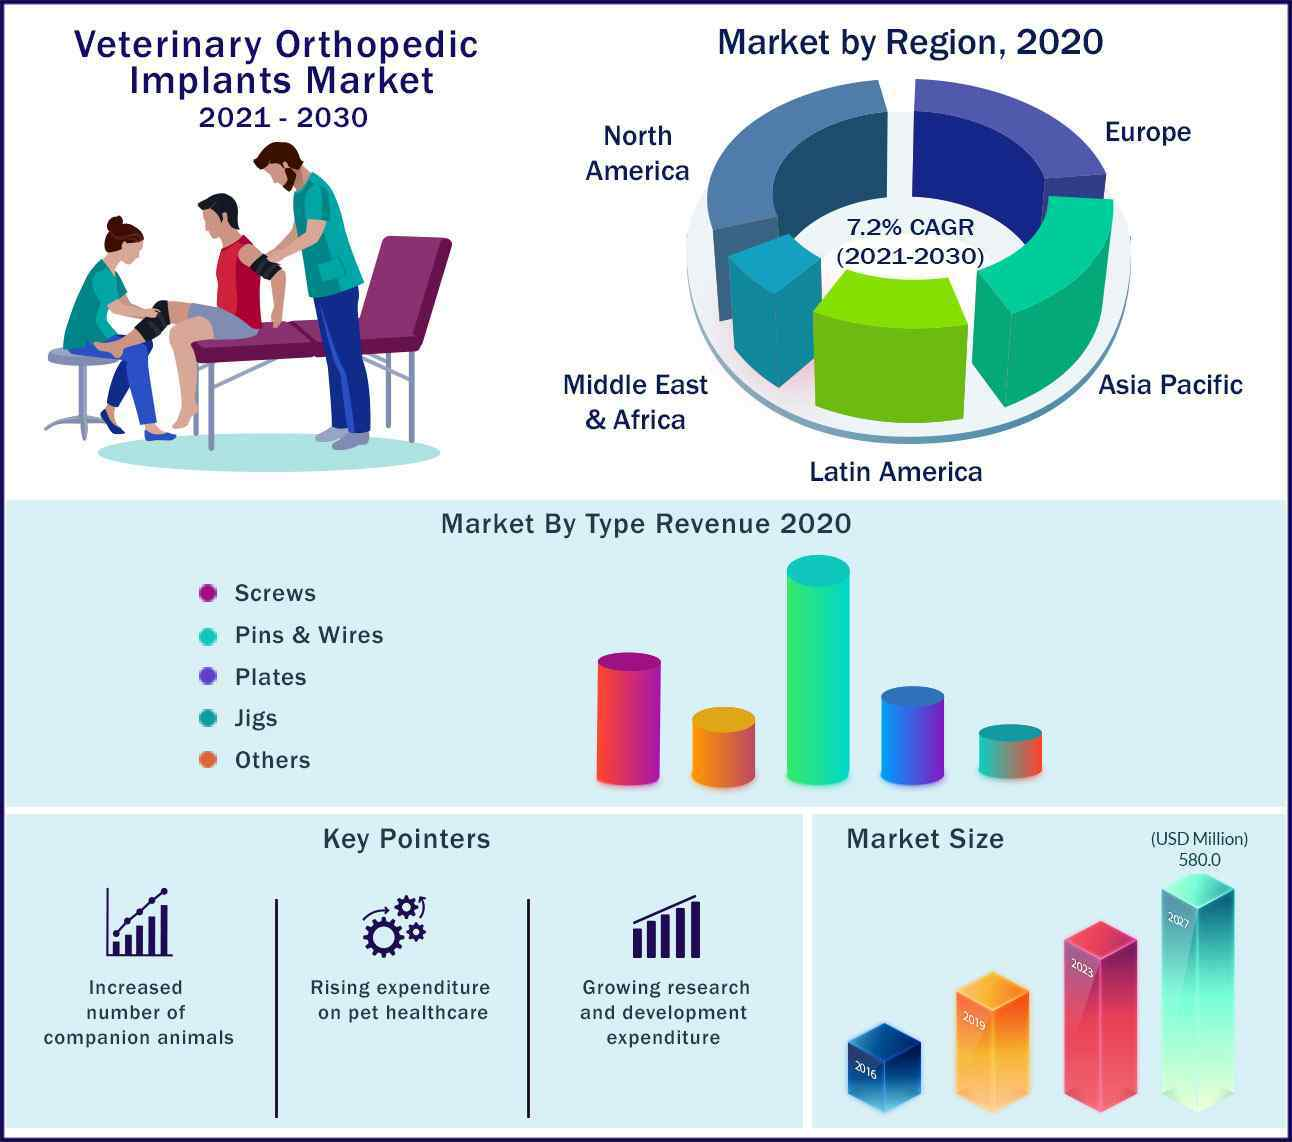 Global Veterinary Orthopedic Implants Market 2021-2030